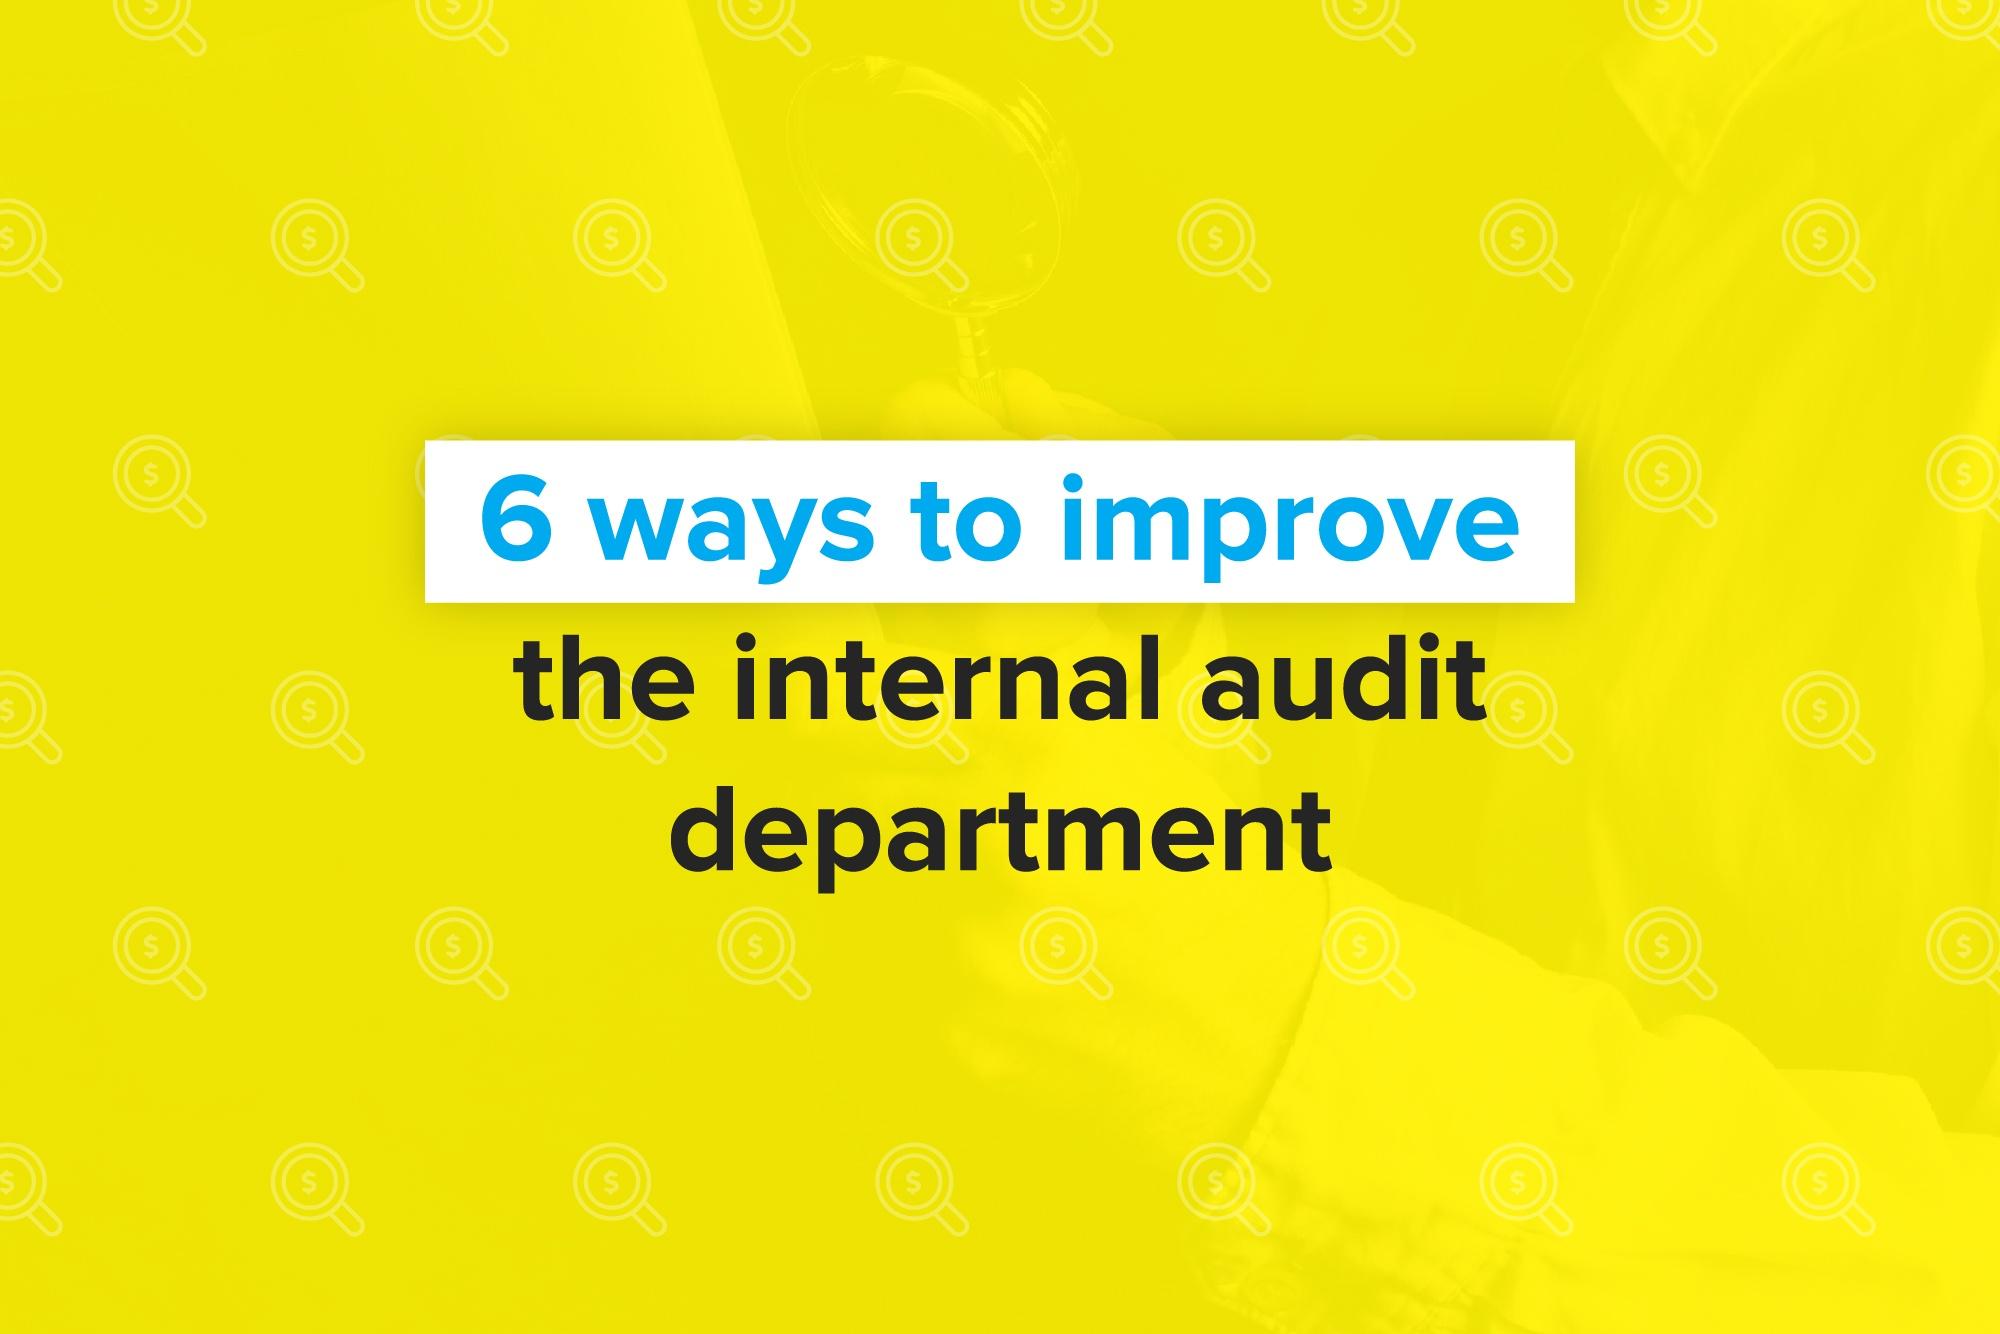 6ways-to-improve-internal-audit.jpg